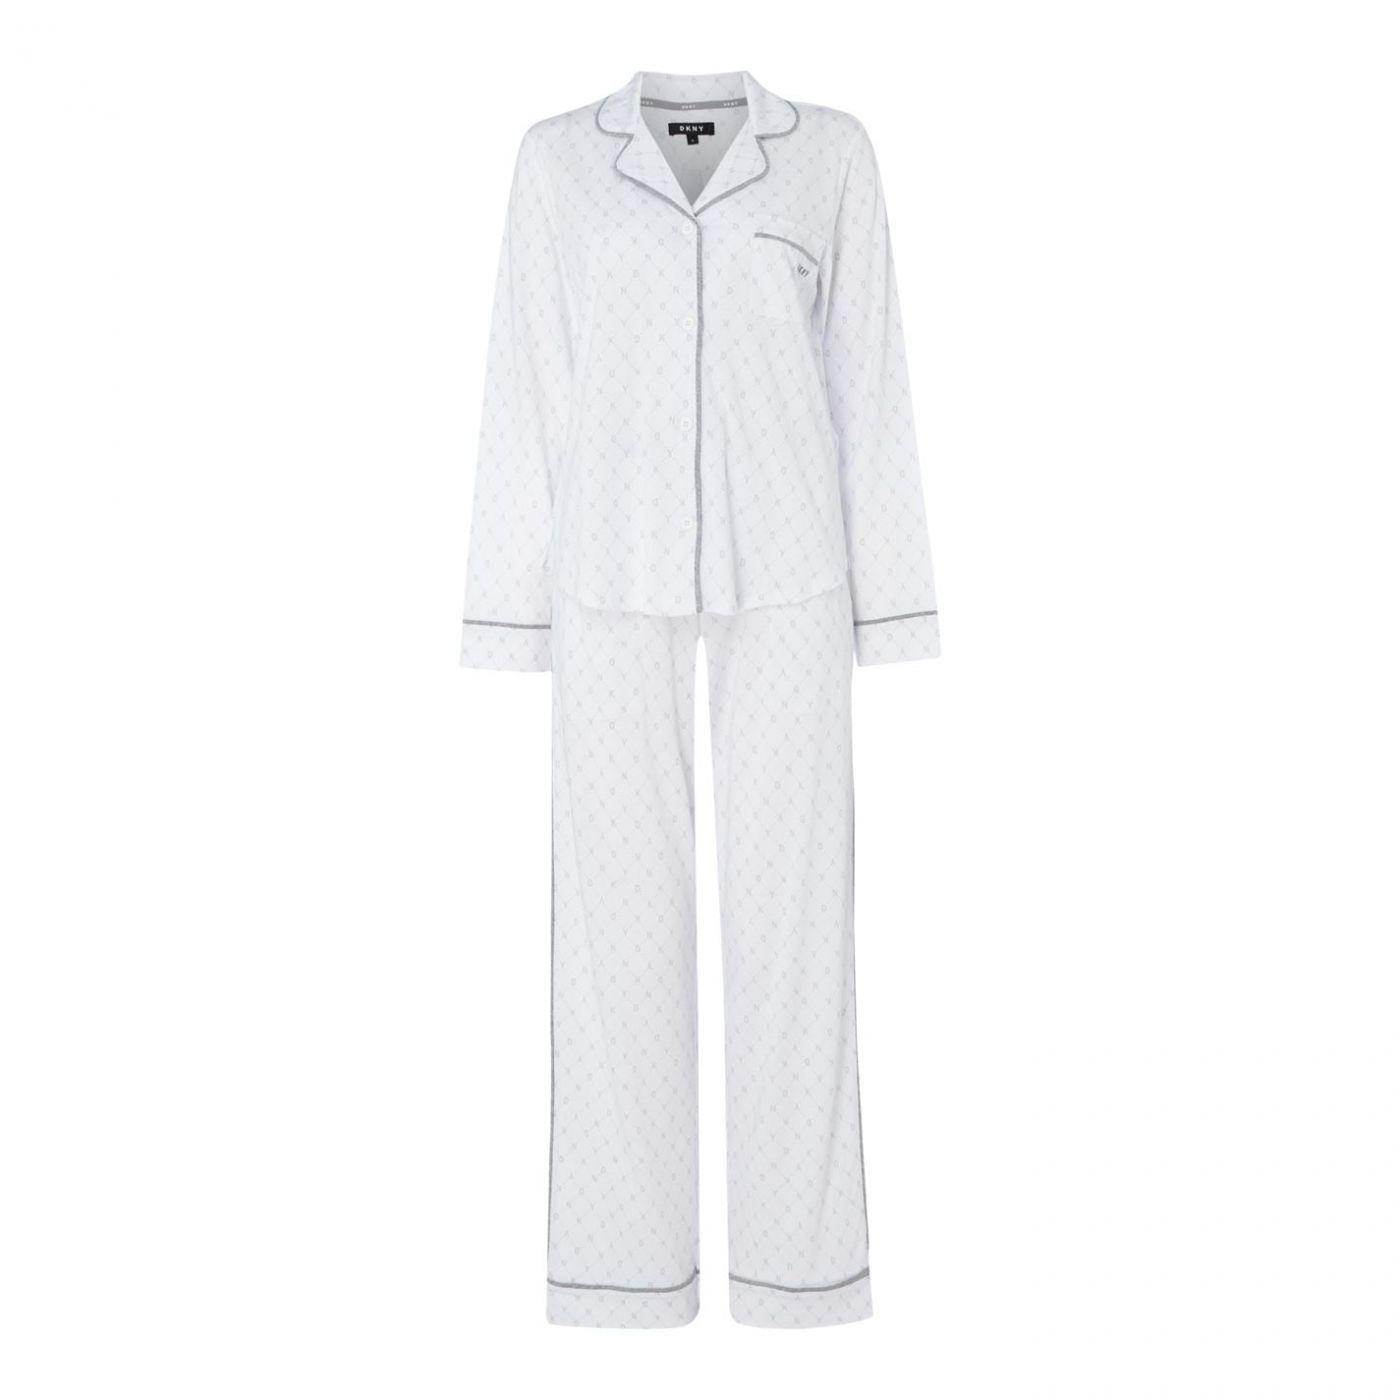 DKNY Signature long sleeve top and pant set